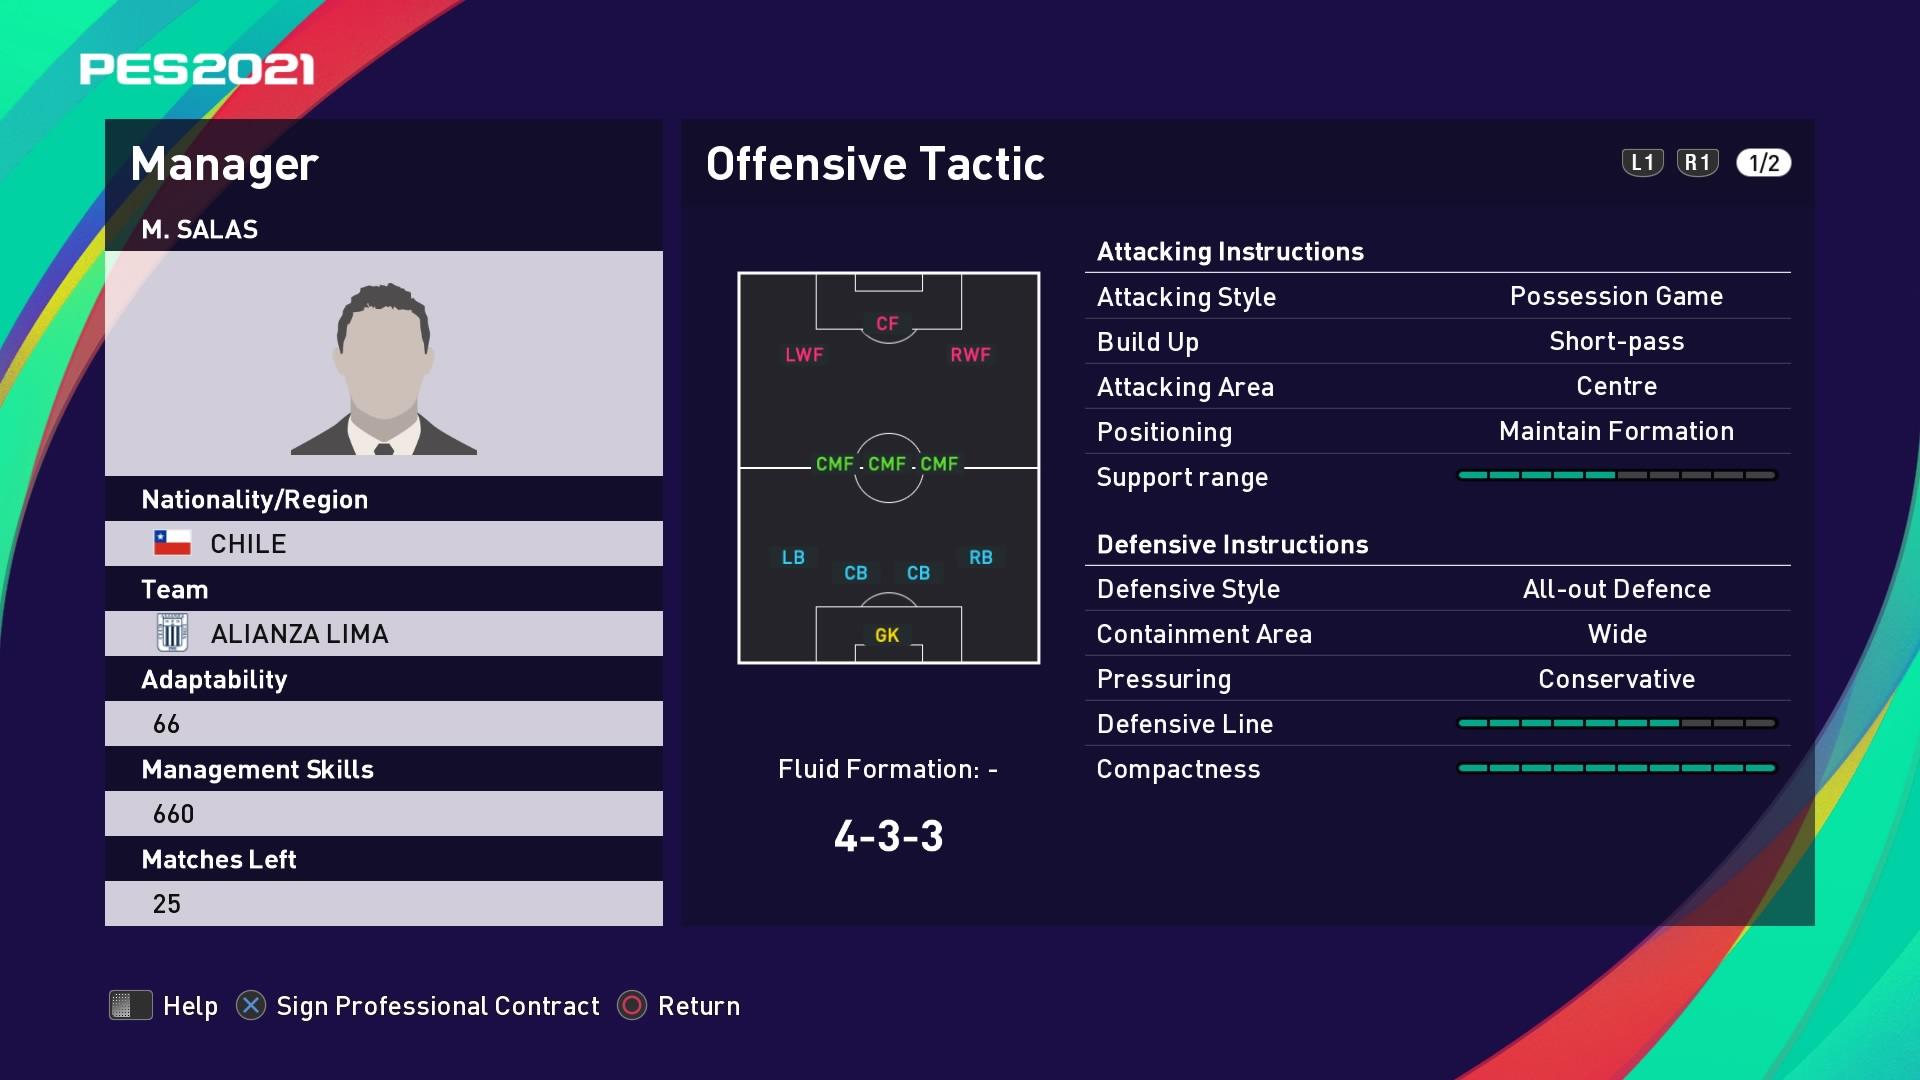 M. Salas (Mario Salas) Offensive Tactic in PES 2021 myClub